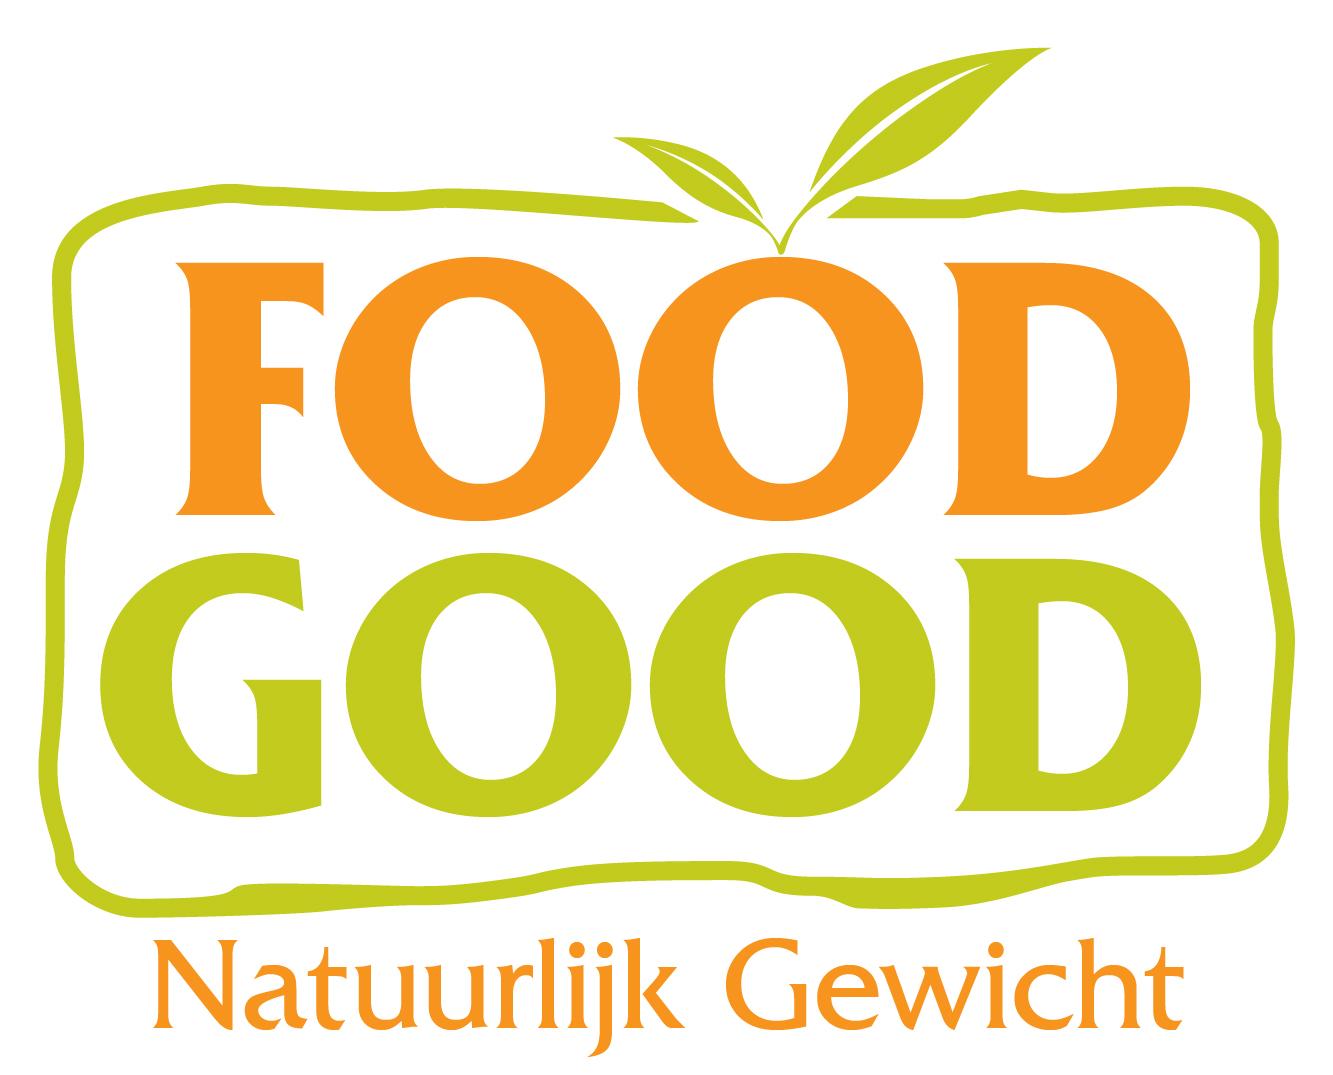 Foodgood.be